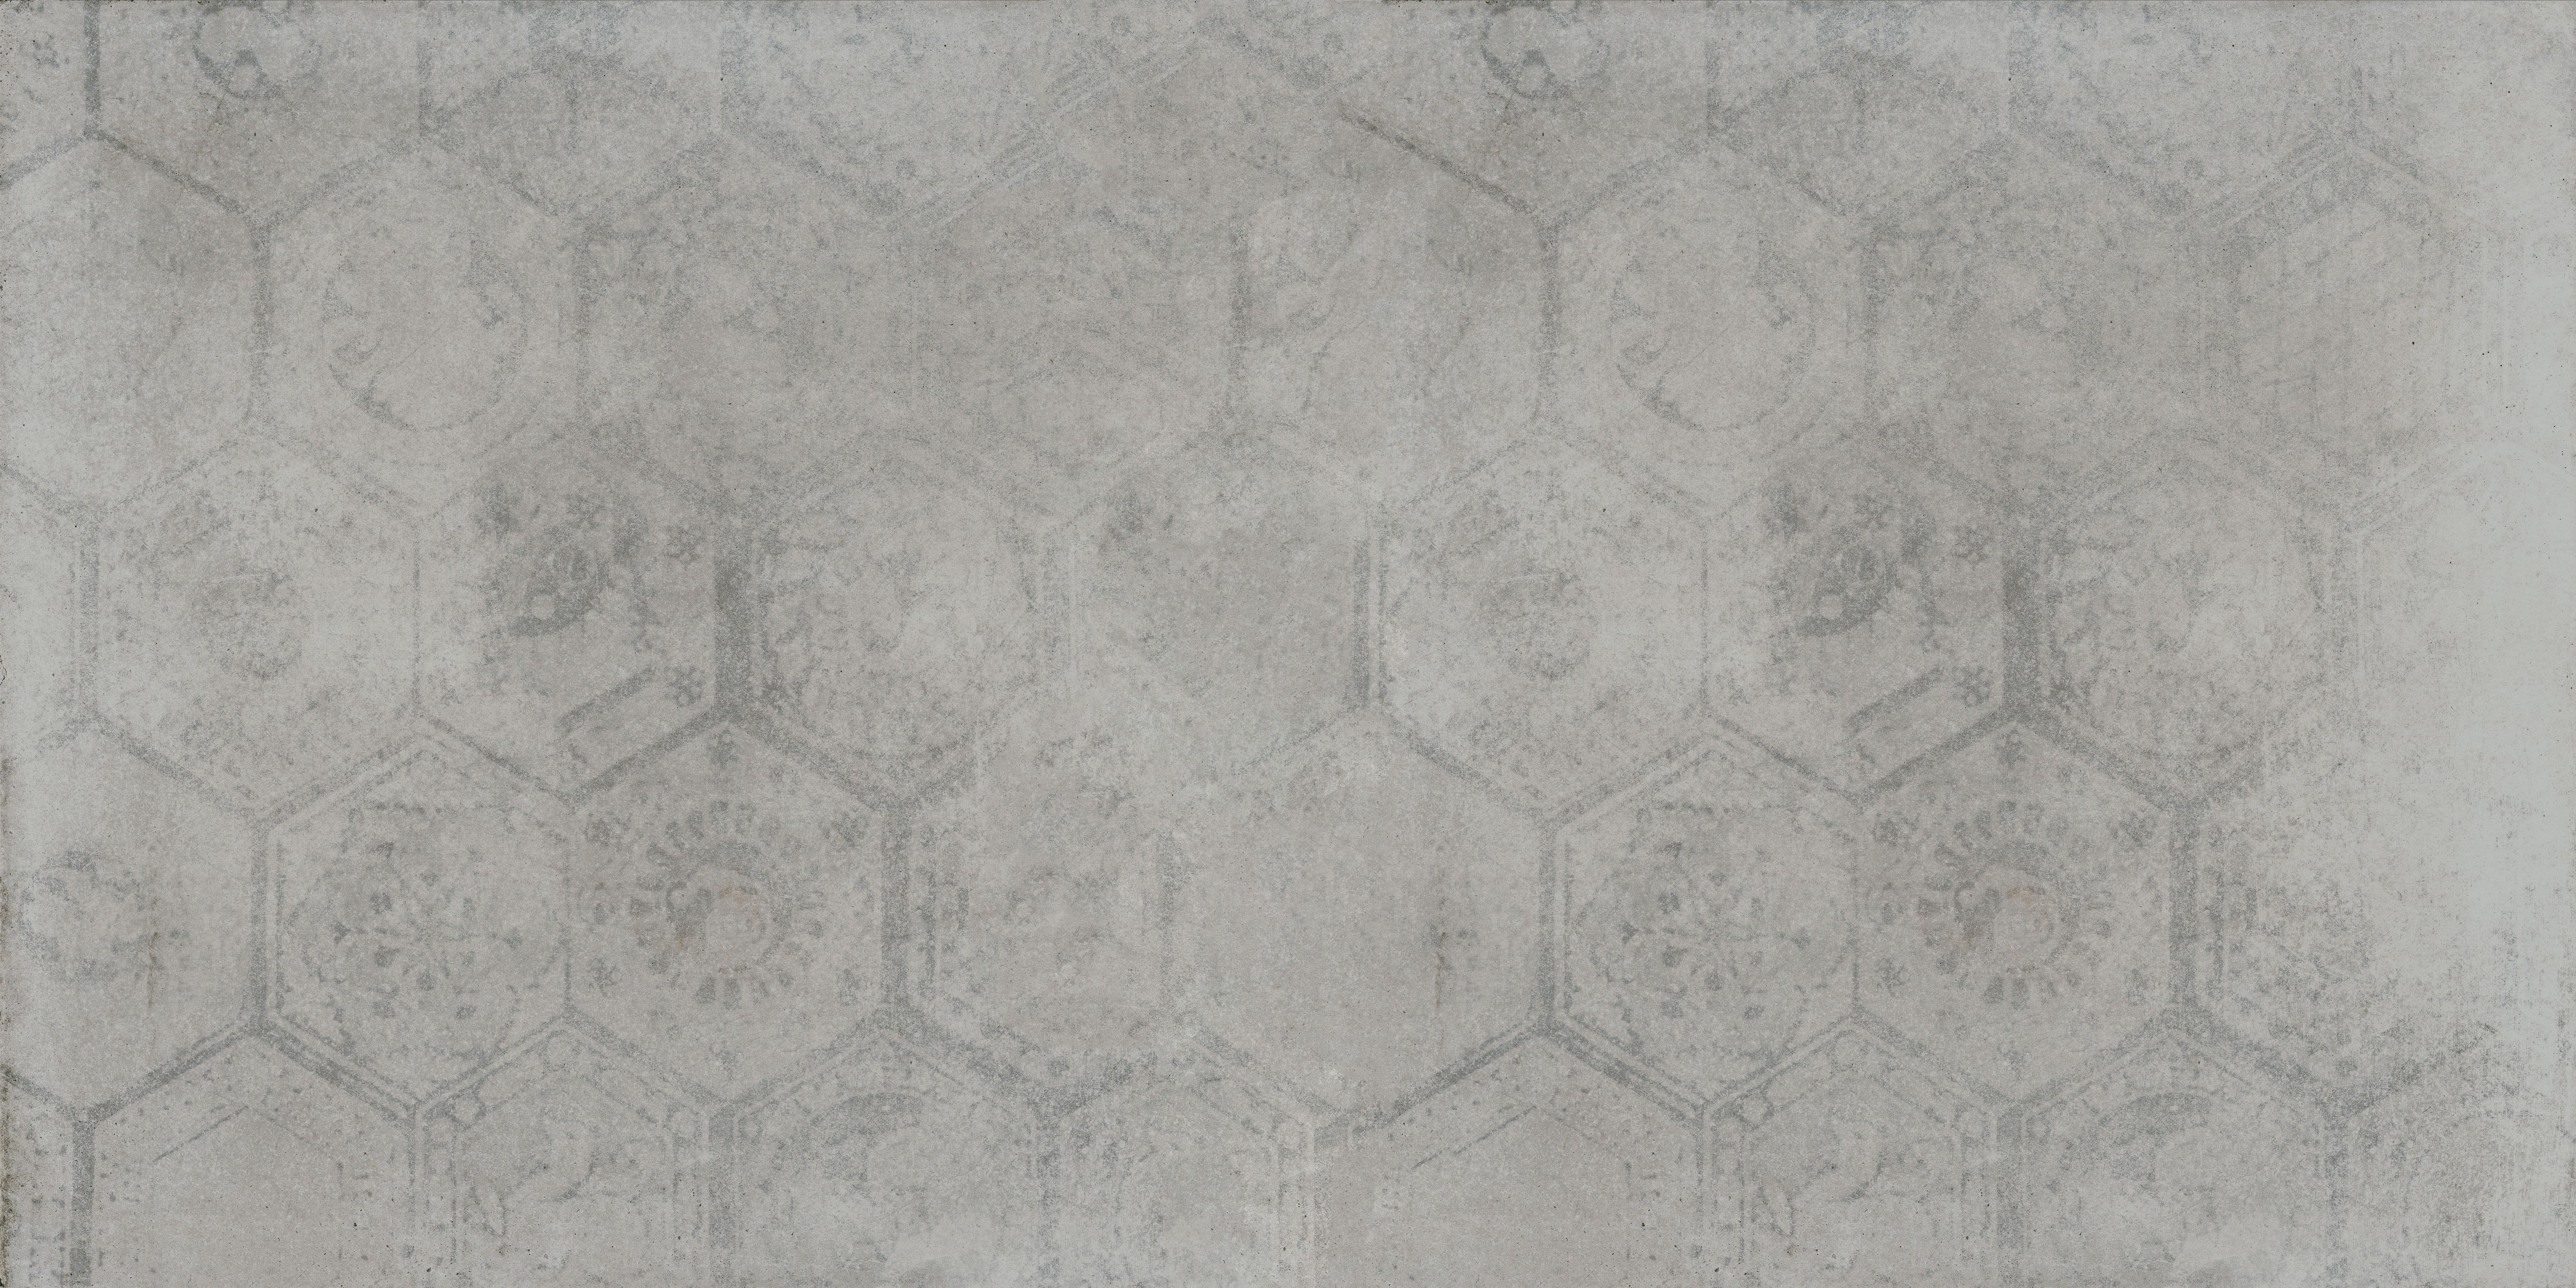 Hexagon Soft Iron